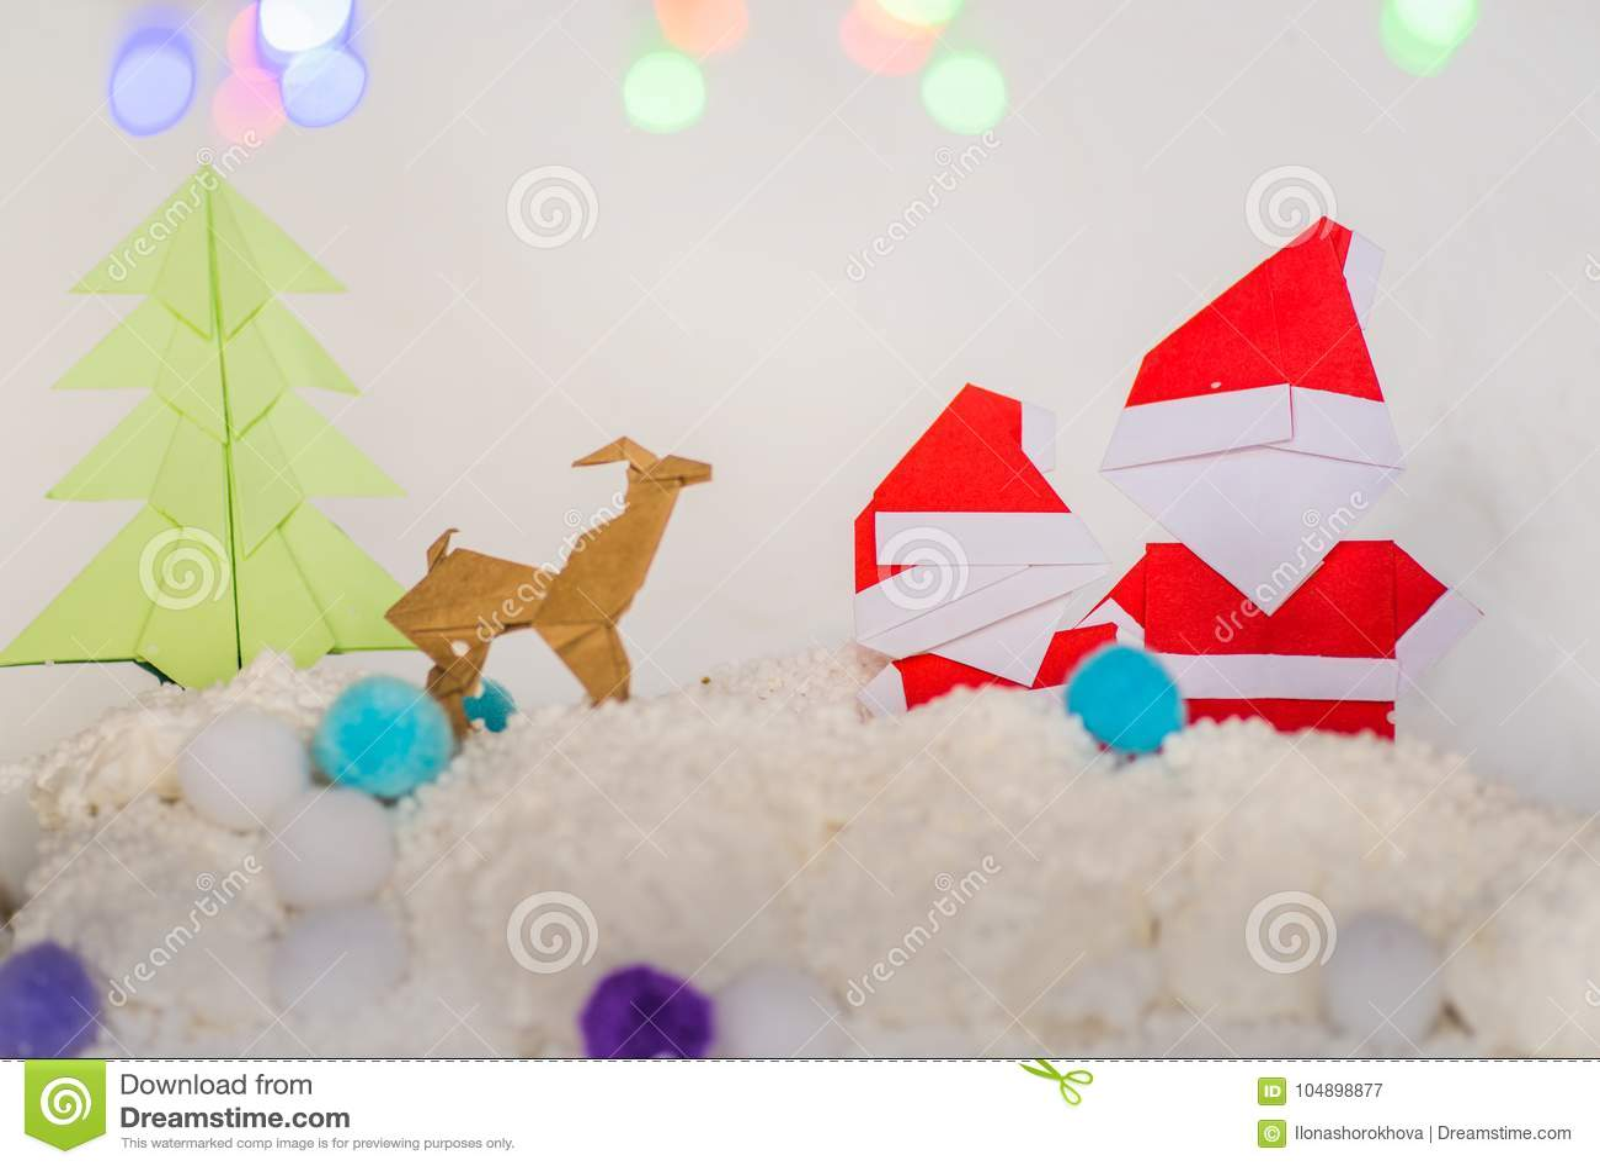 Santa Clausxmas Tree And Reindeer Christmas Paper Craft Stock Image